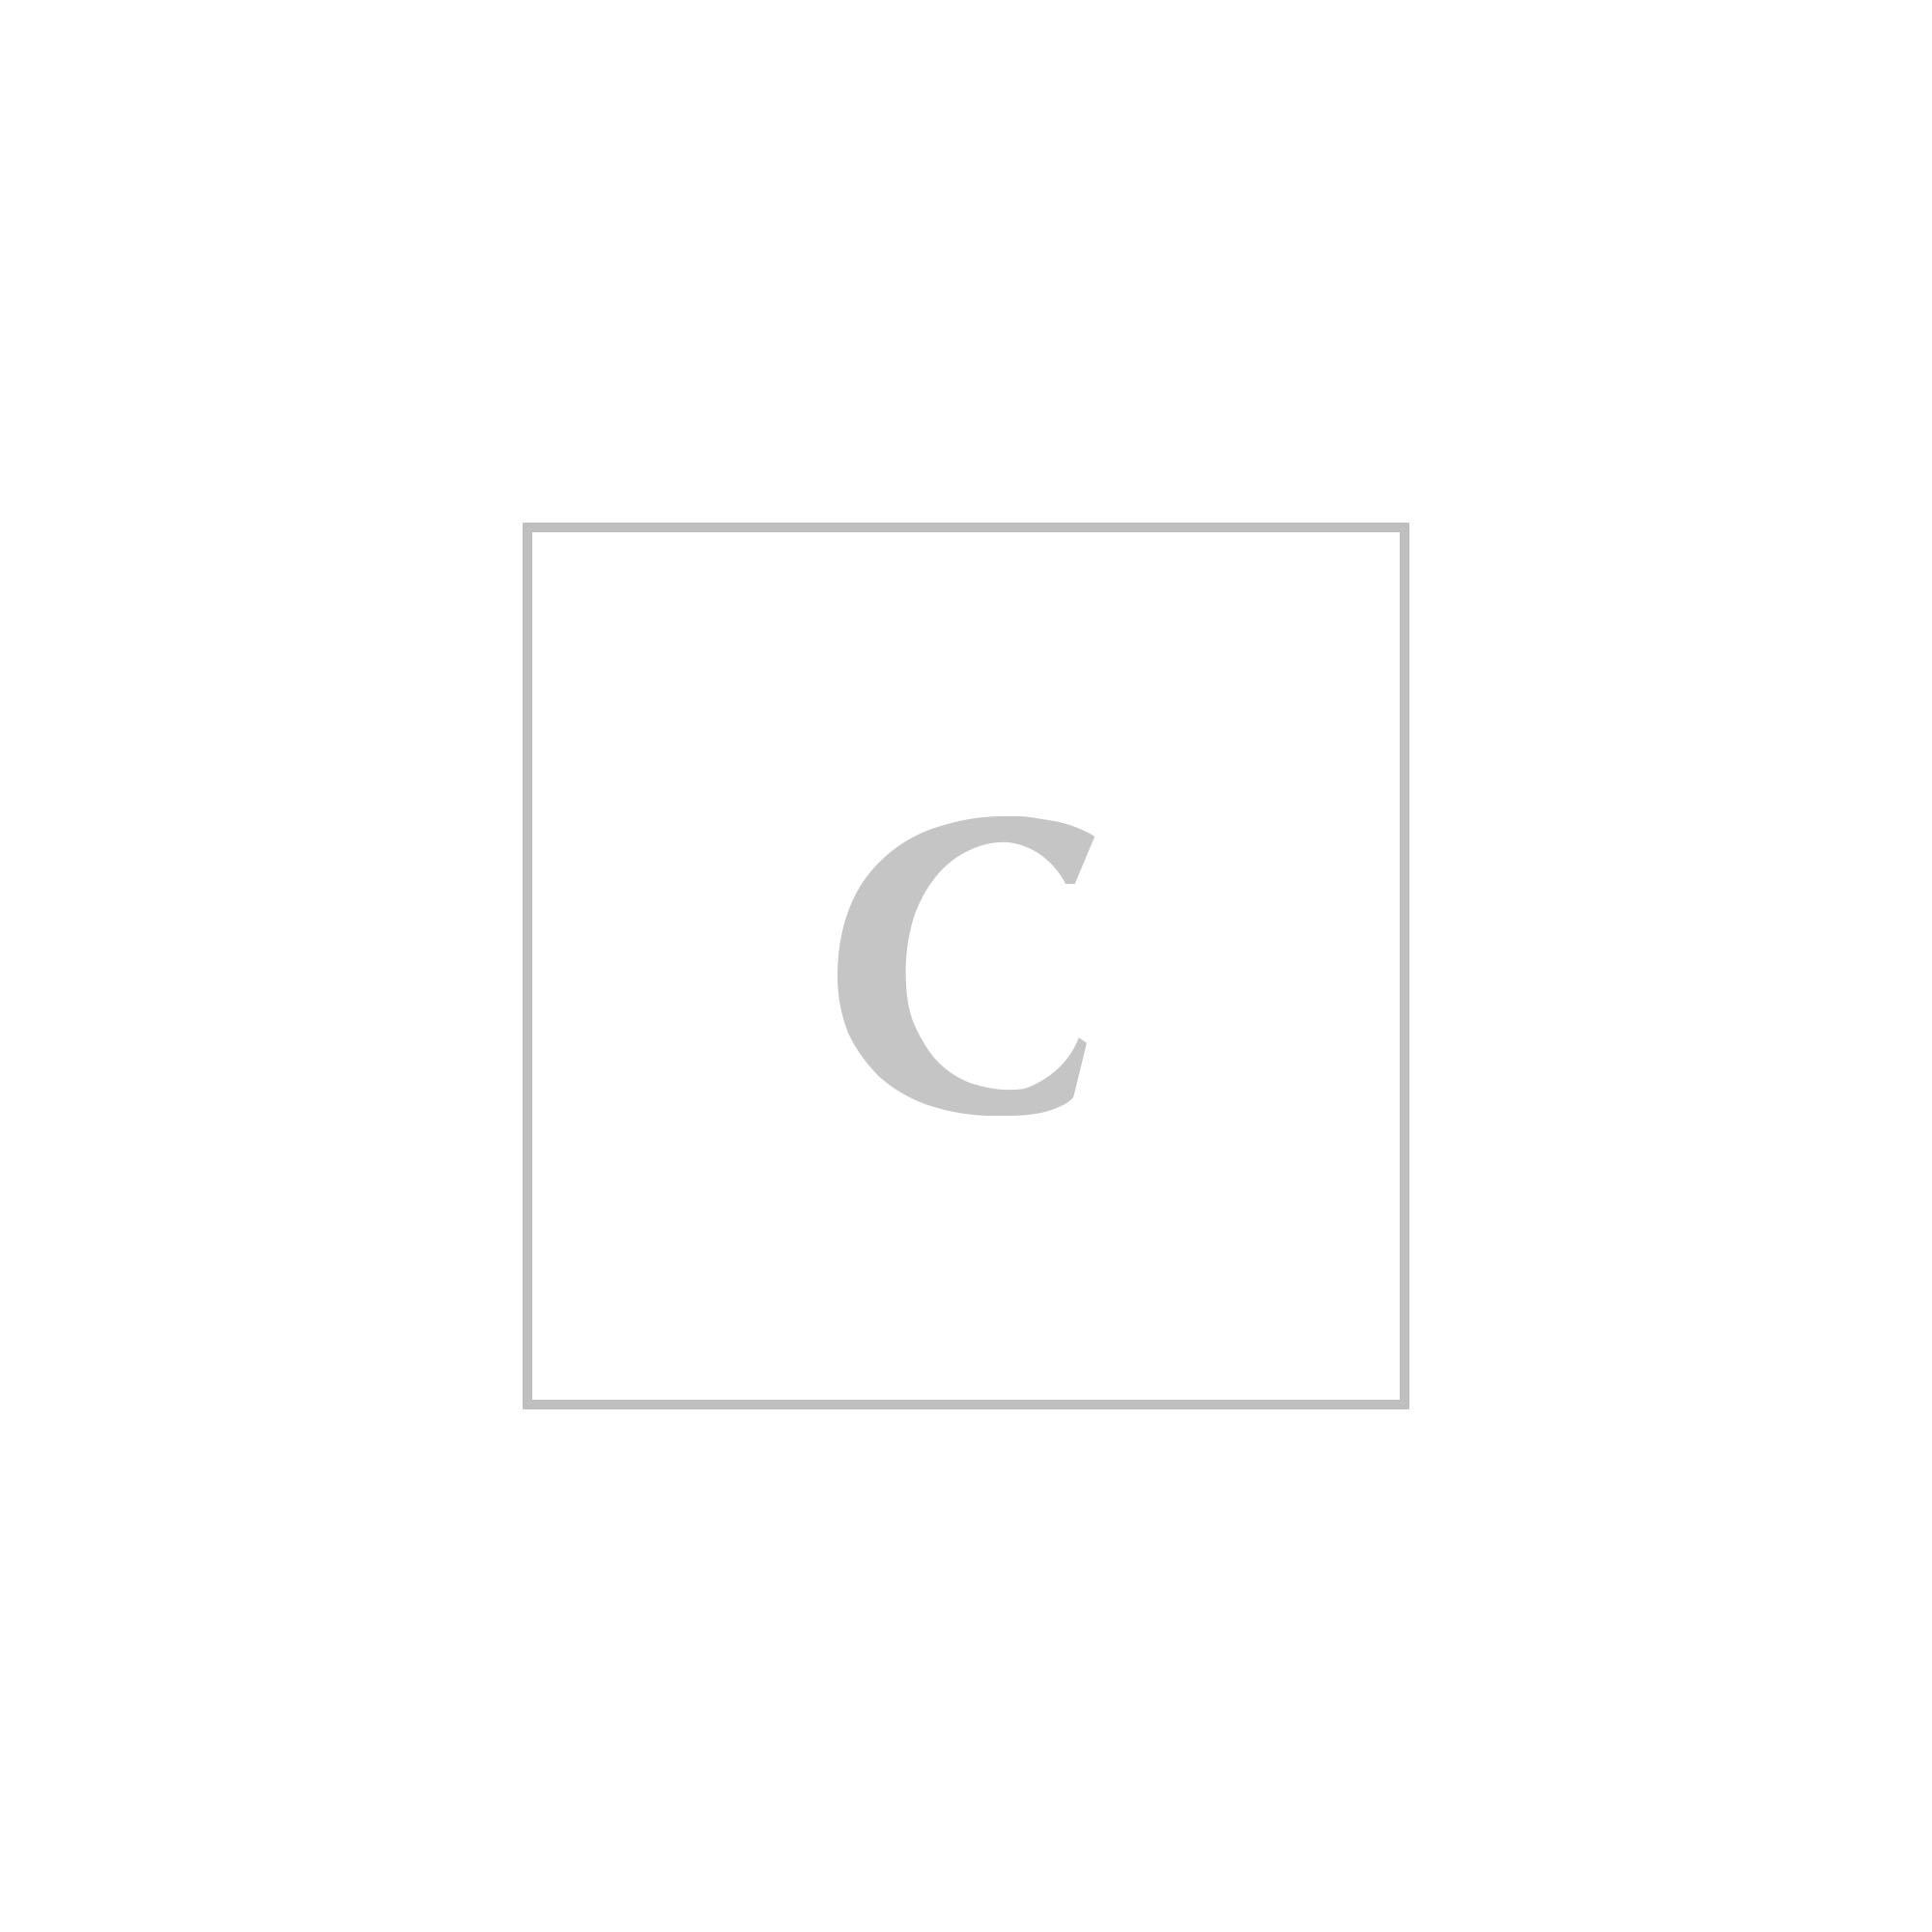 Saint laurent ysl borsa monogramme grain